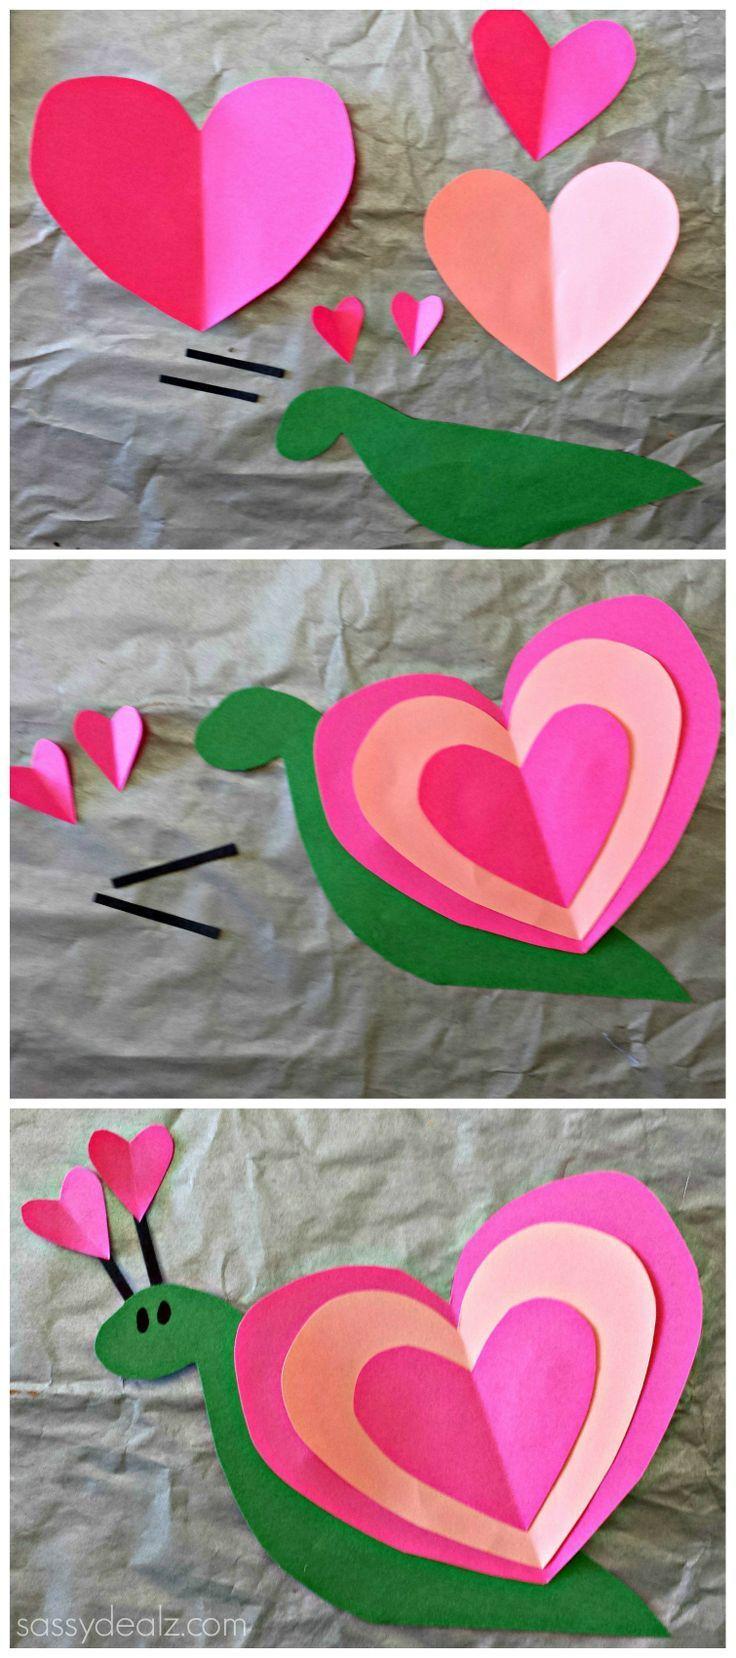 Heart Snail Craft For Kids (Valentine Art Project) #Heart shaped animal #DIY #Kids valentine | http://www.sassydealz.com/2014/01/heart-snail-craft-kids-valentine-art-project.html